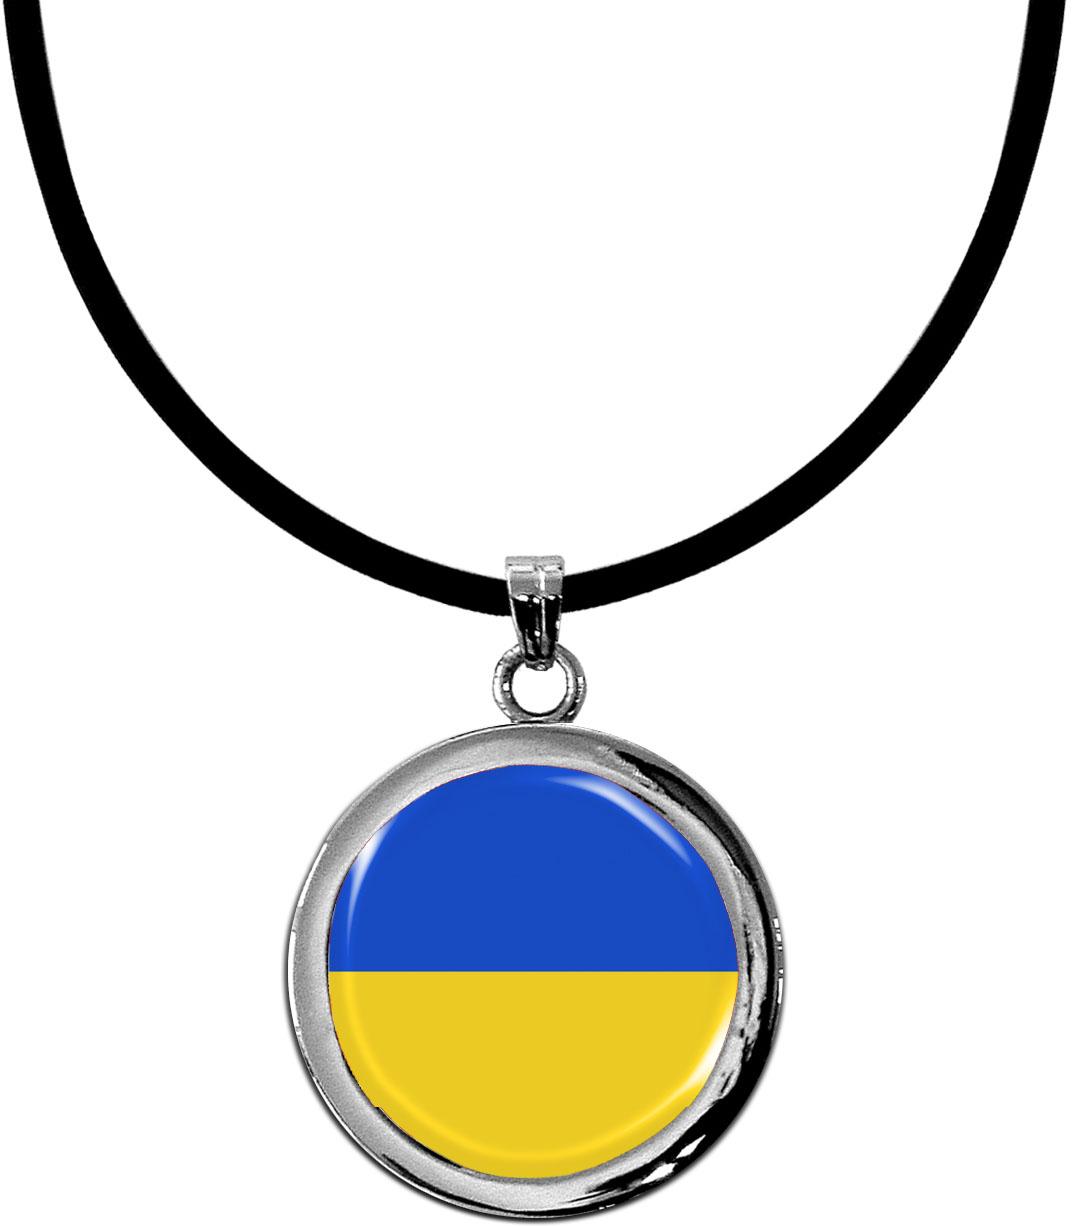 Kettenanhänger / Ukraine / Silikonband mit Silberverschluss